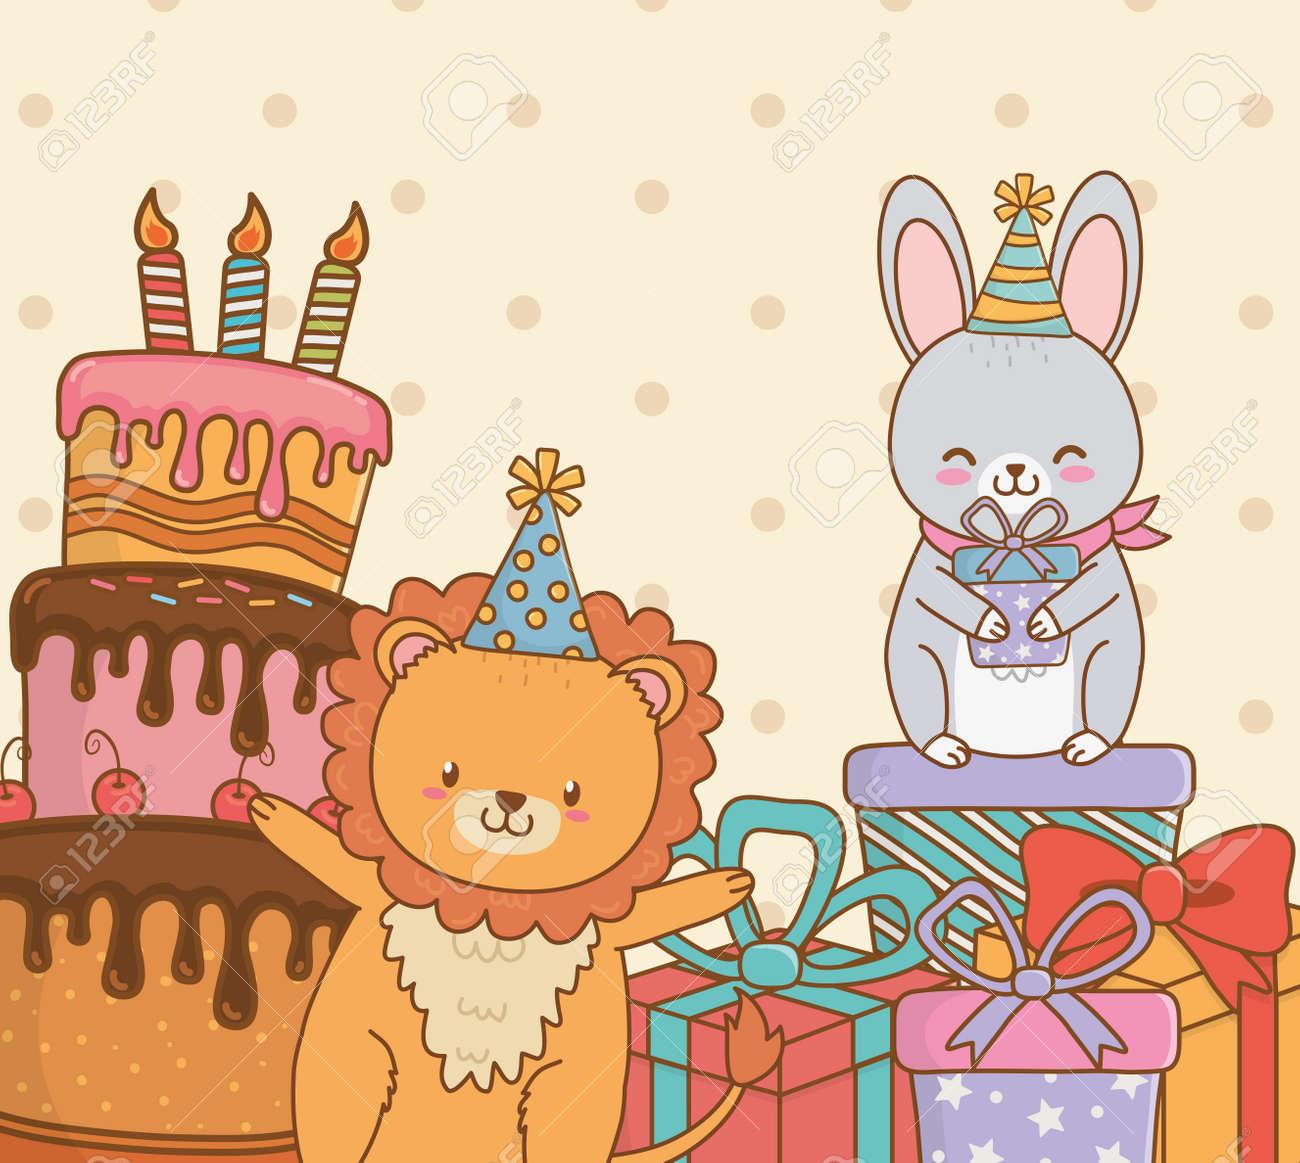 birthday card with cute animals woodland vector illustration design - 123807127